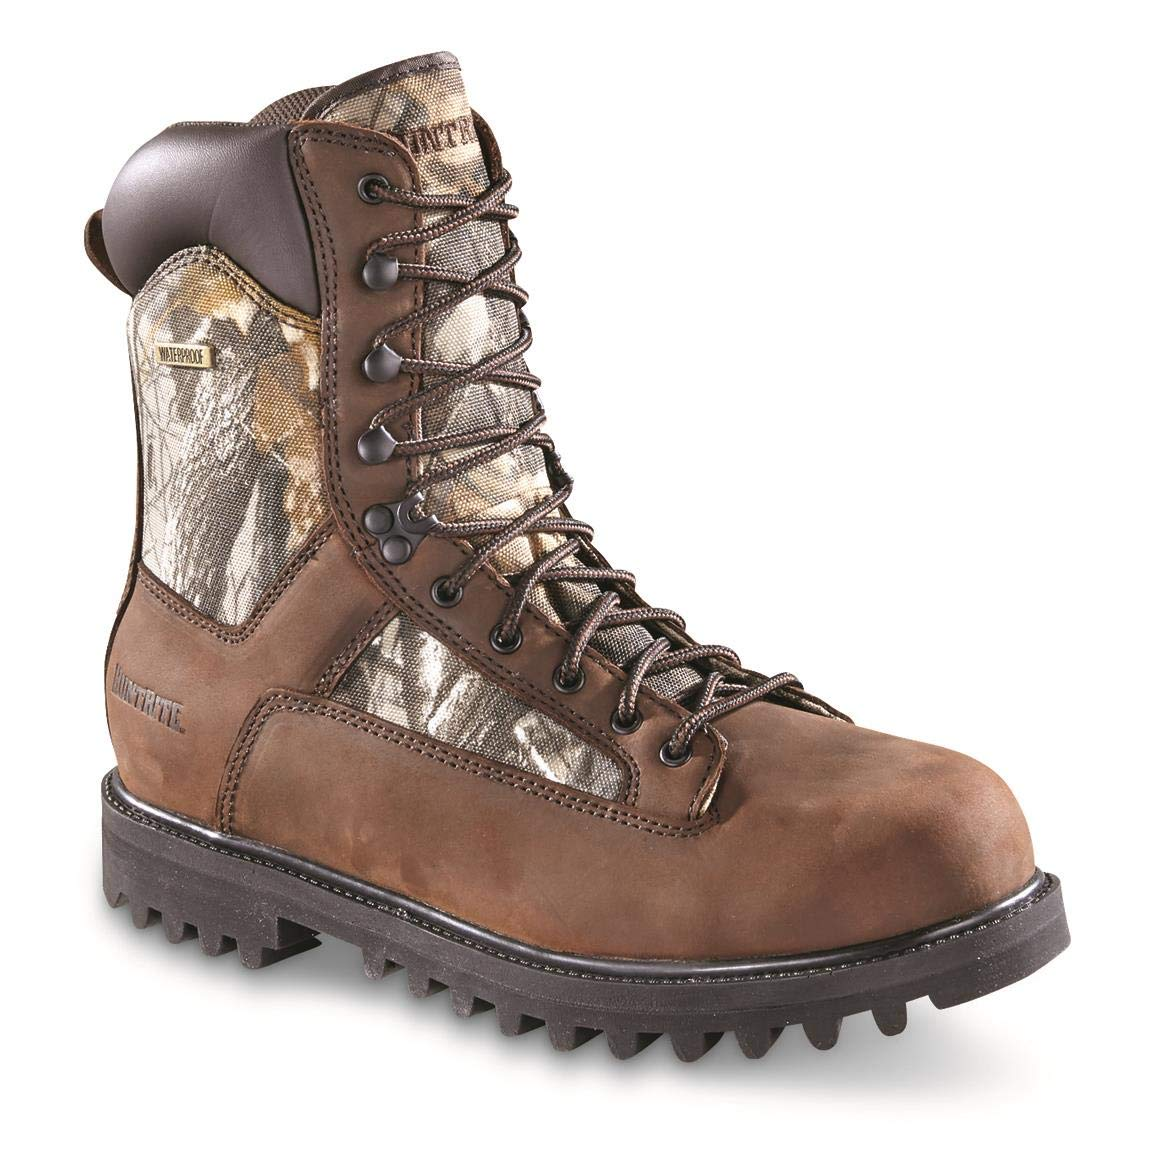 Huntrite Men's Insulated Waterproof Hunting Boots, 400-gram, Realtree Hardwoods Gray, 12D (Medium)